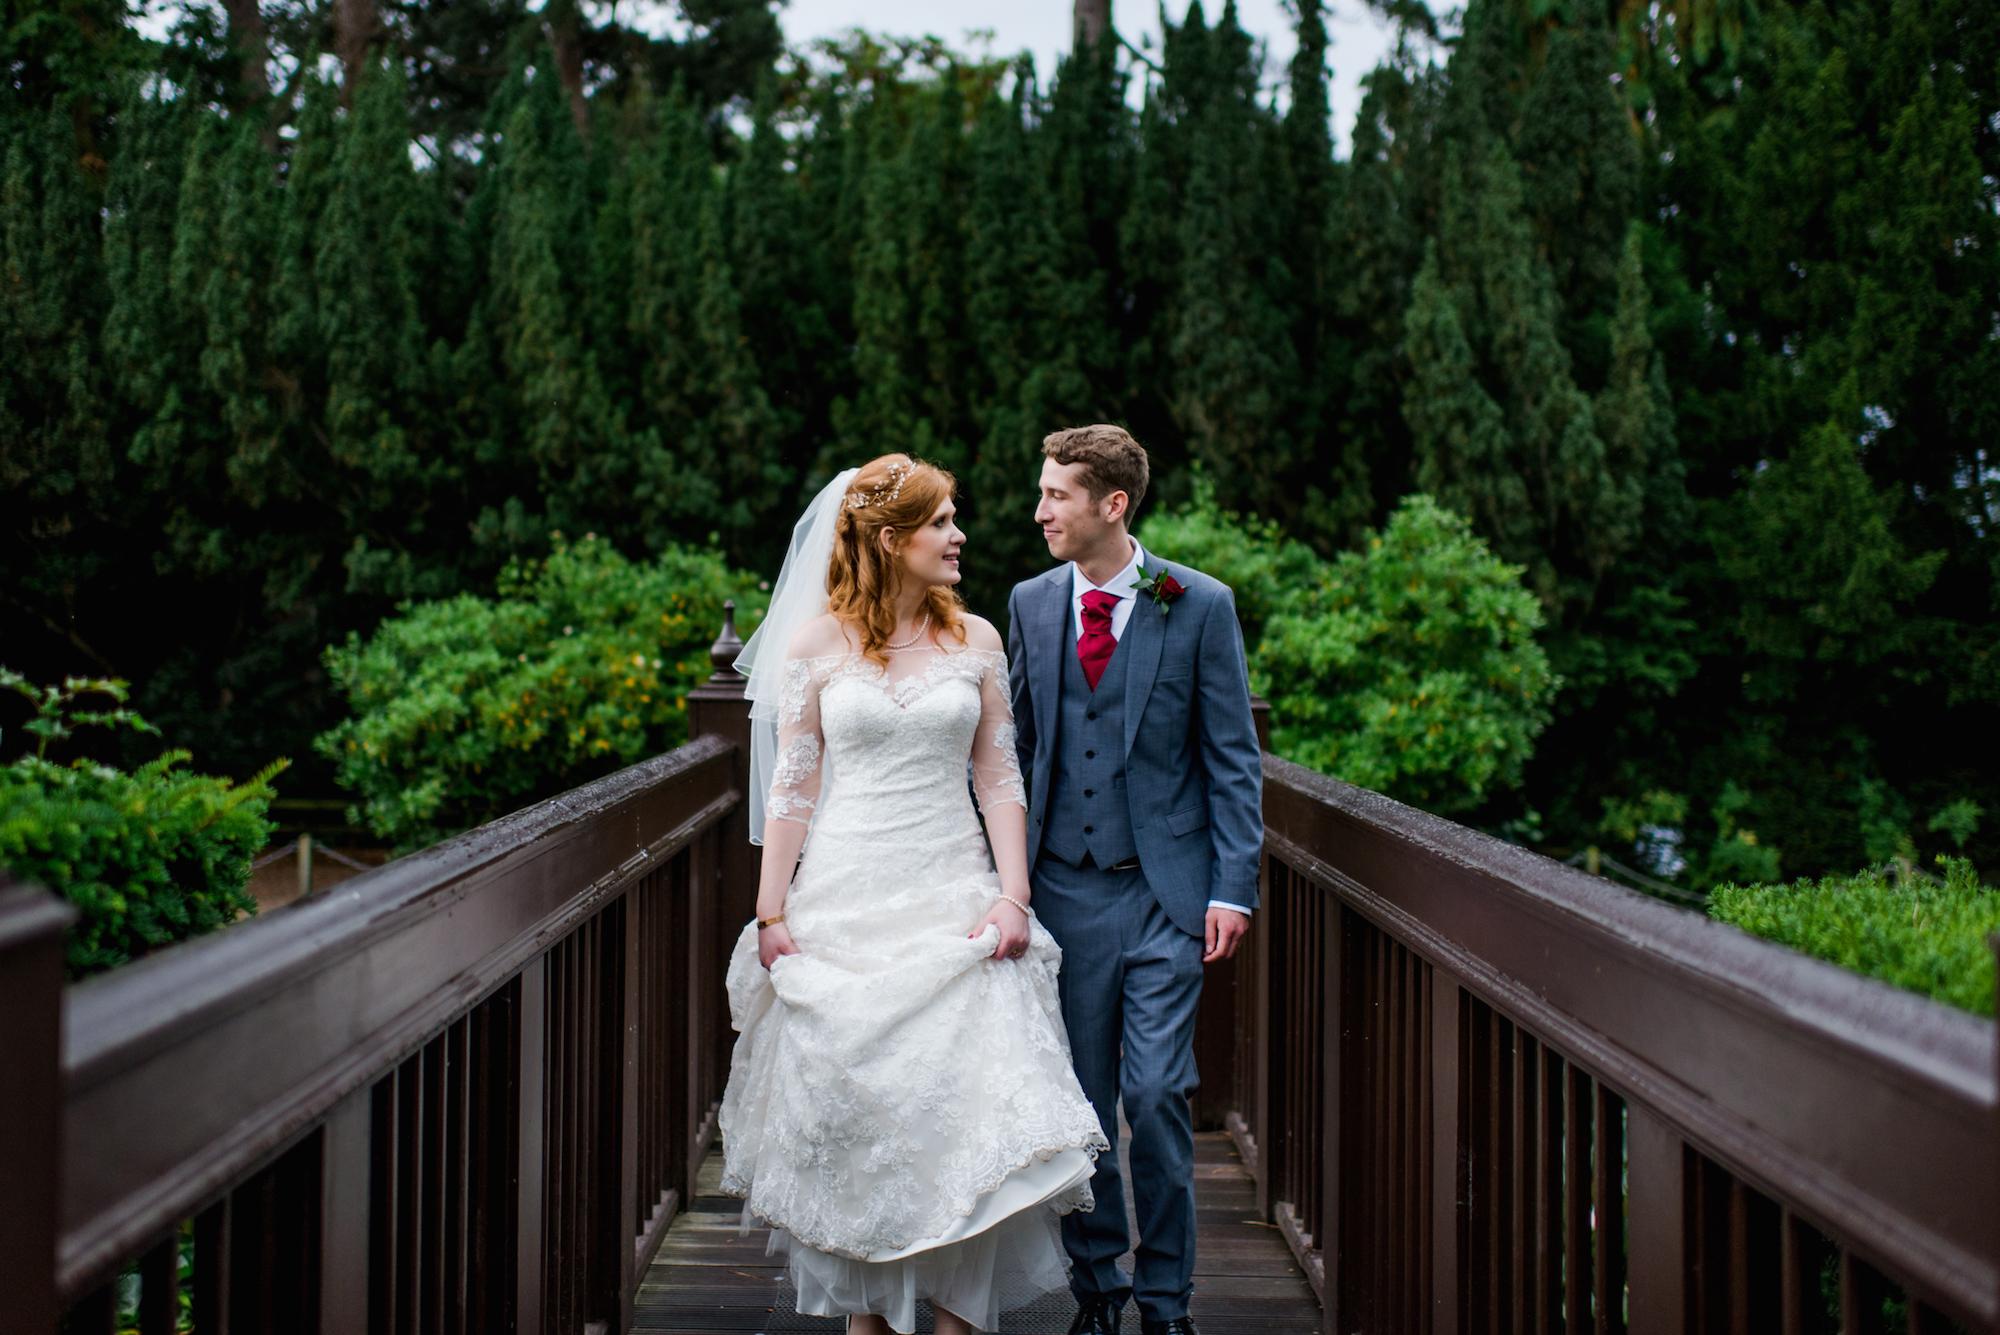 121 Bride Groom London Wedding Photographer Photography.jpg